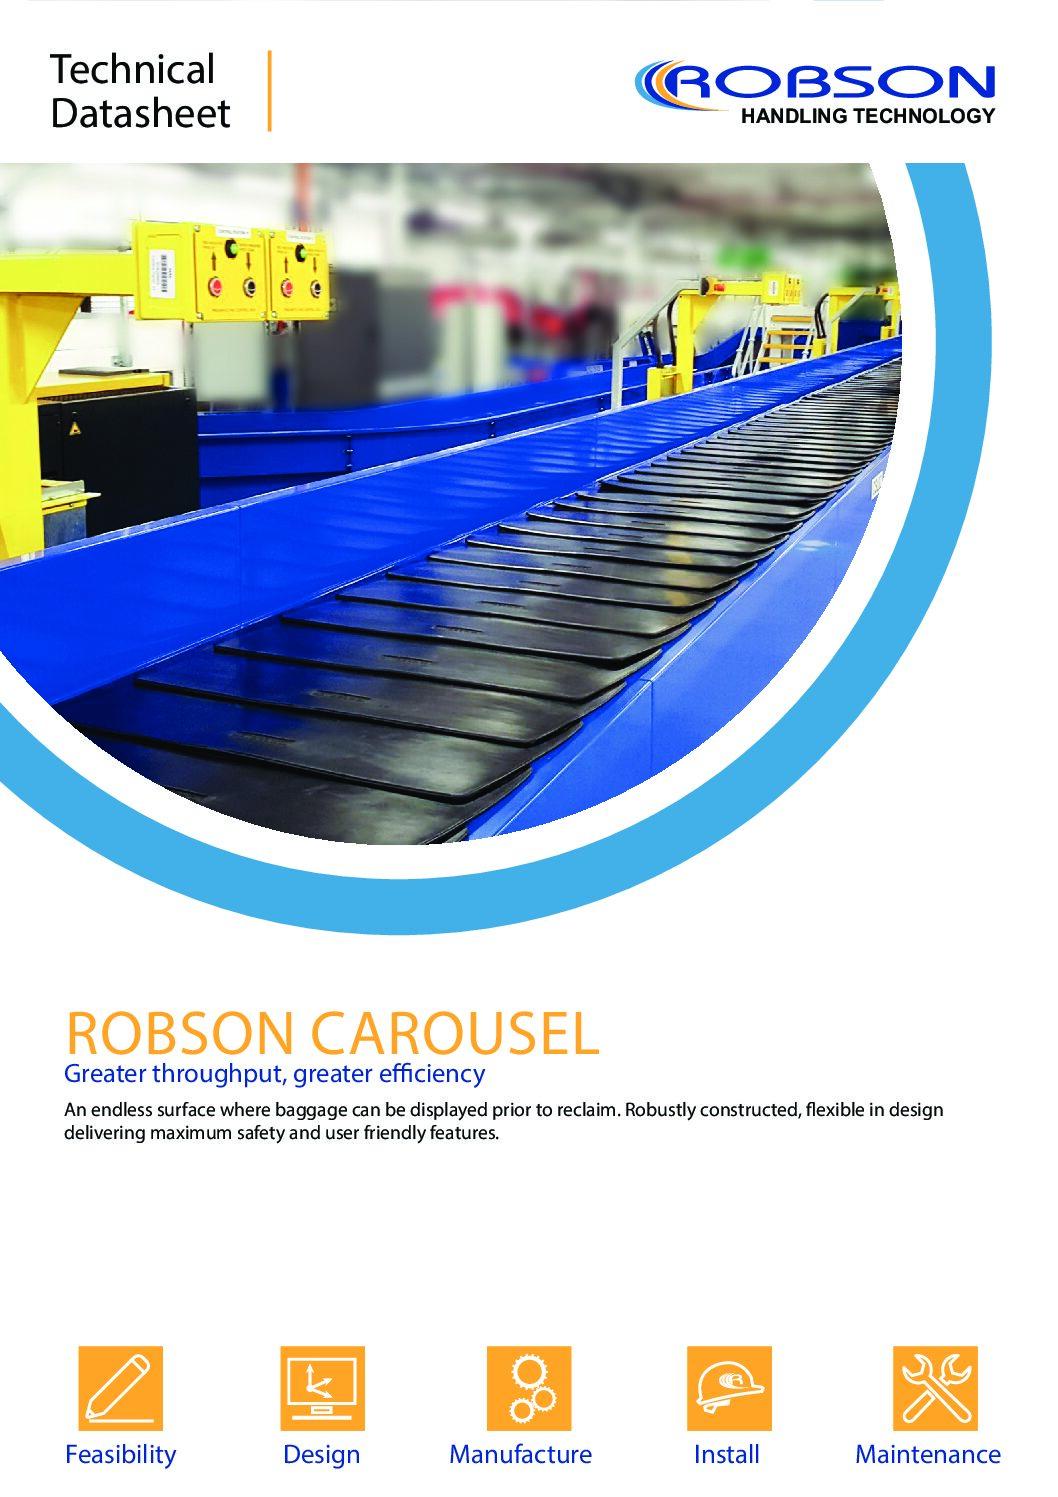 Robson Carousels